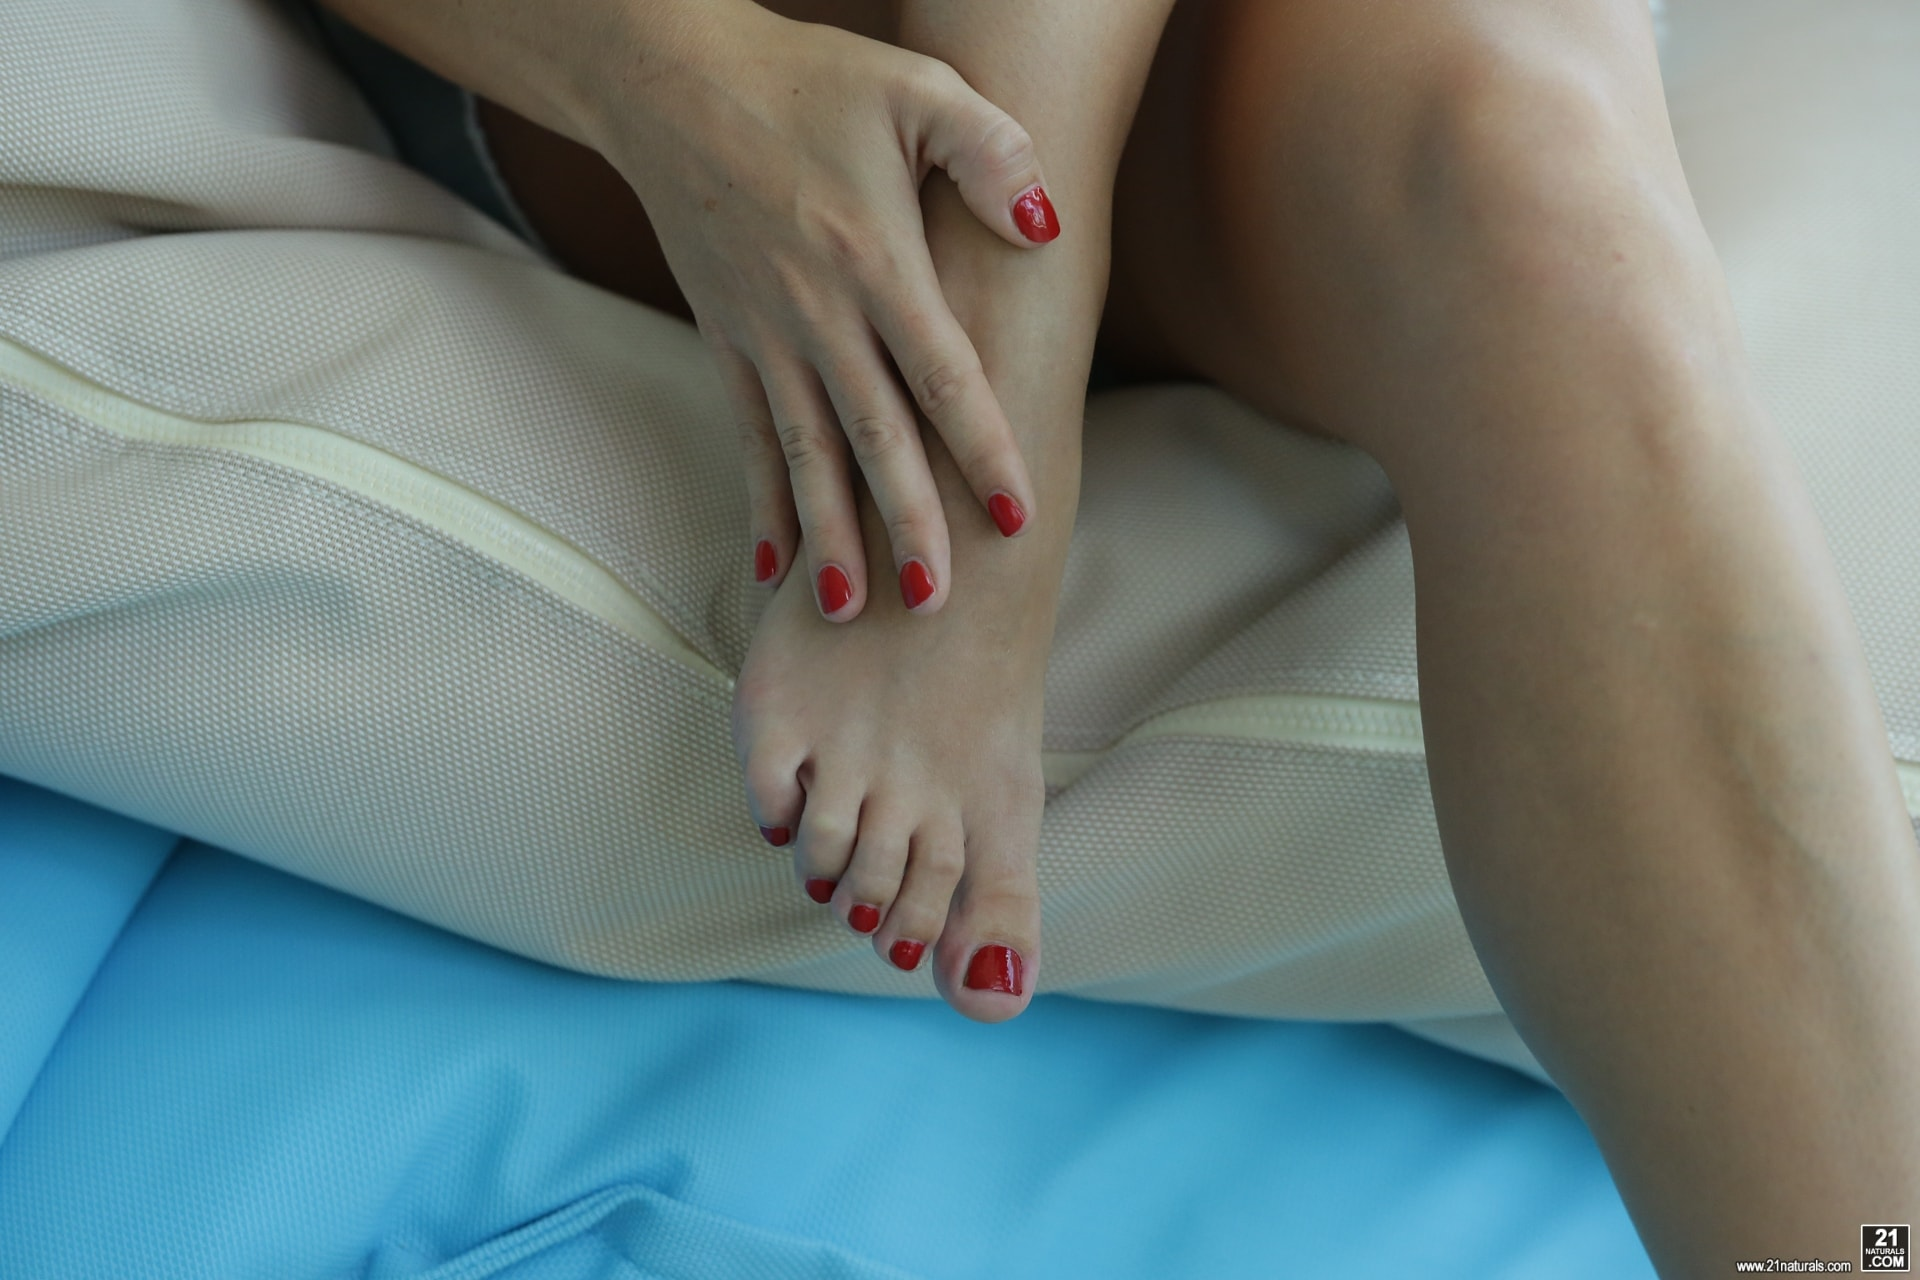 21Sextury 'The Forbidden Fruit' starring Rossella Visconti (Photo 39)